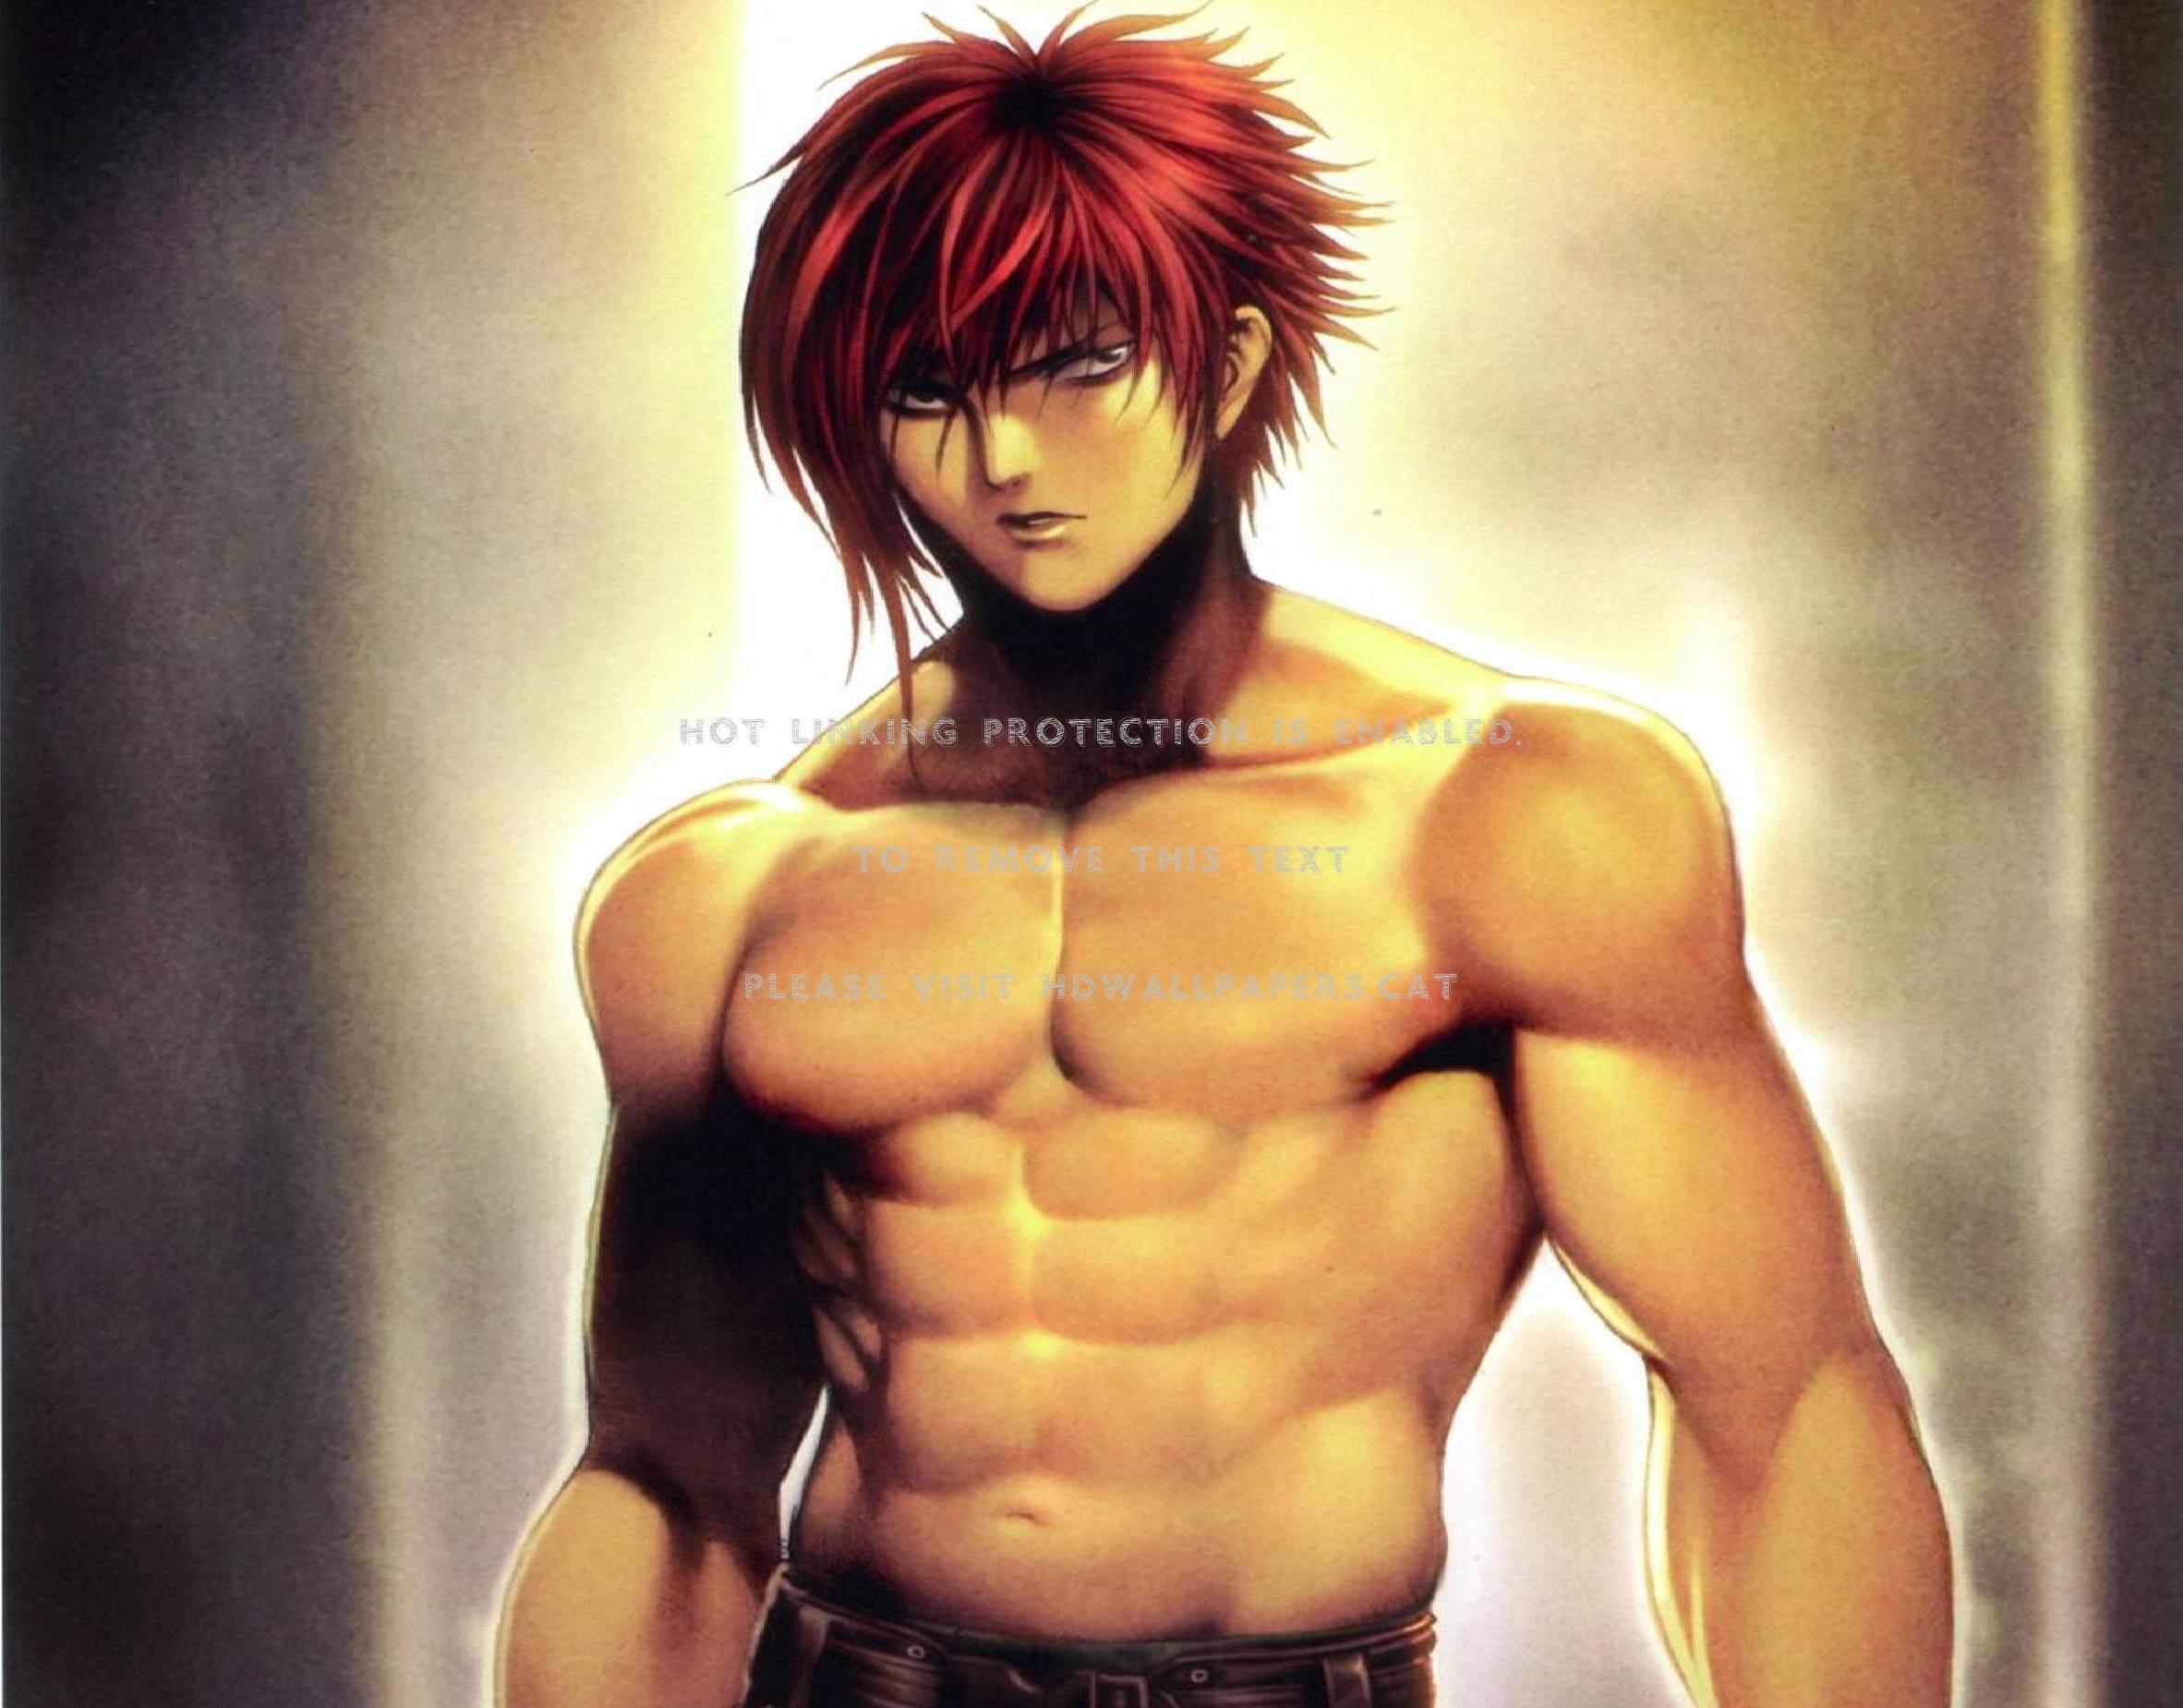 Baki The Grappler Hanma Muscles Red Hair Baki The Grappler Muscles 2364x1850 Wallpaper Teahub Io